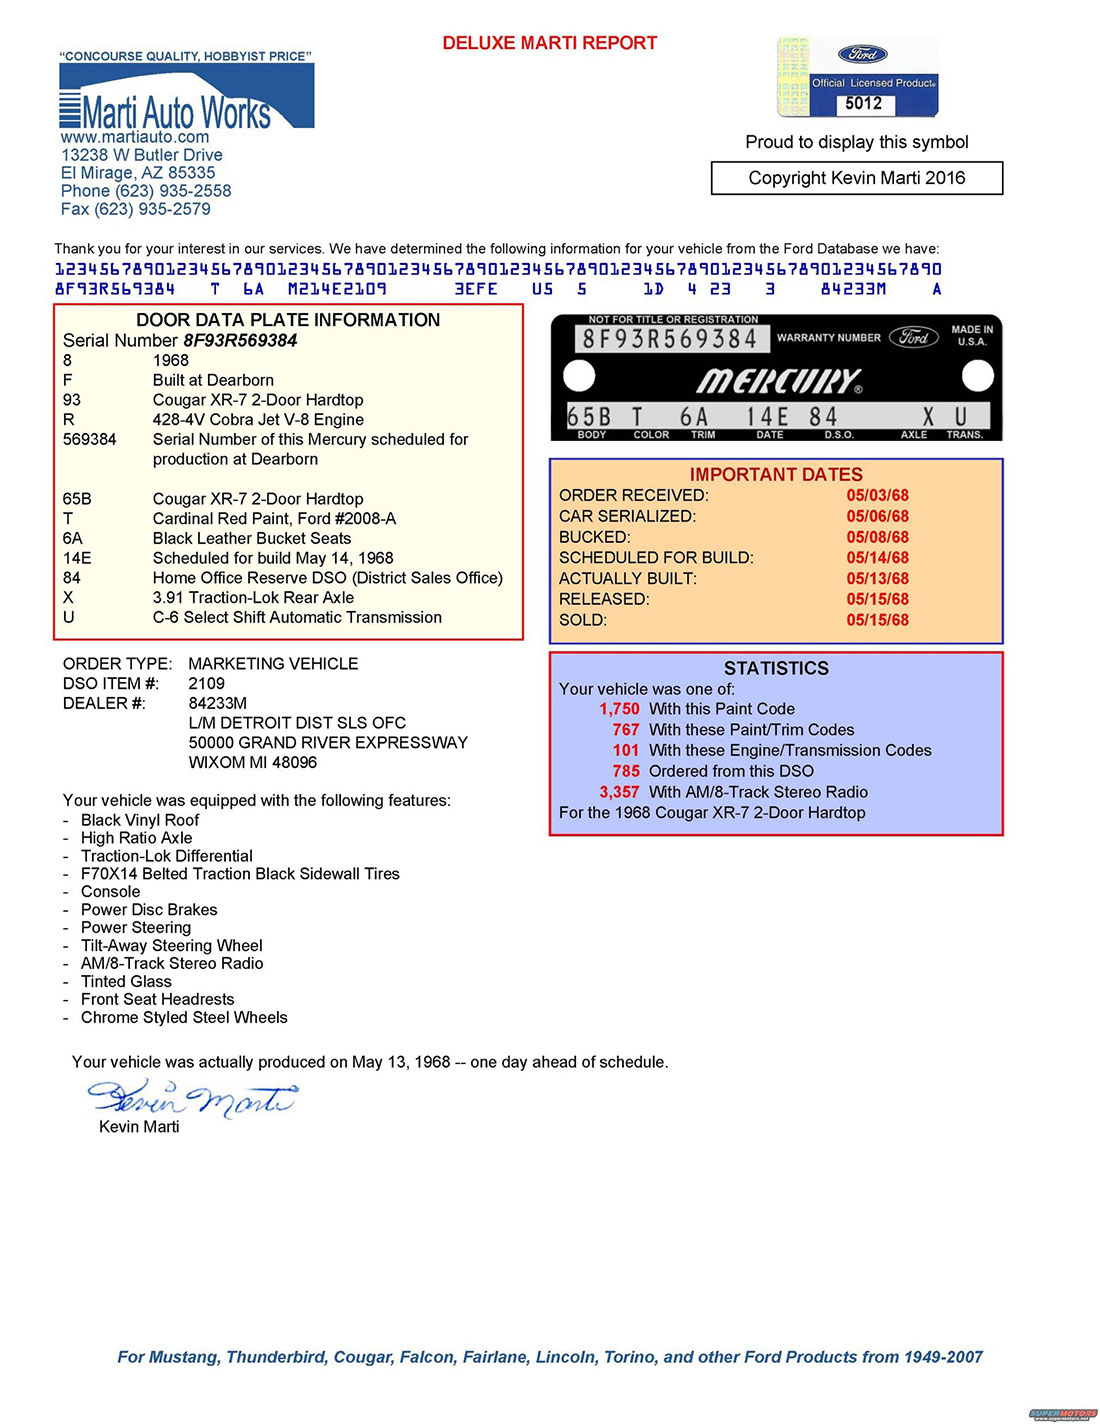 1968 Mercury Cougar R-Code Option Marti Report